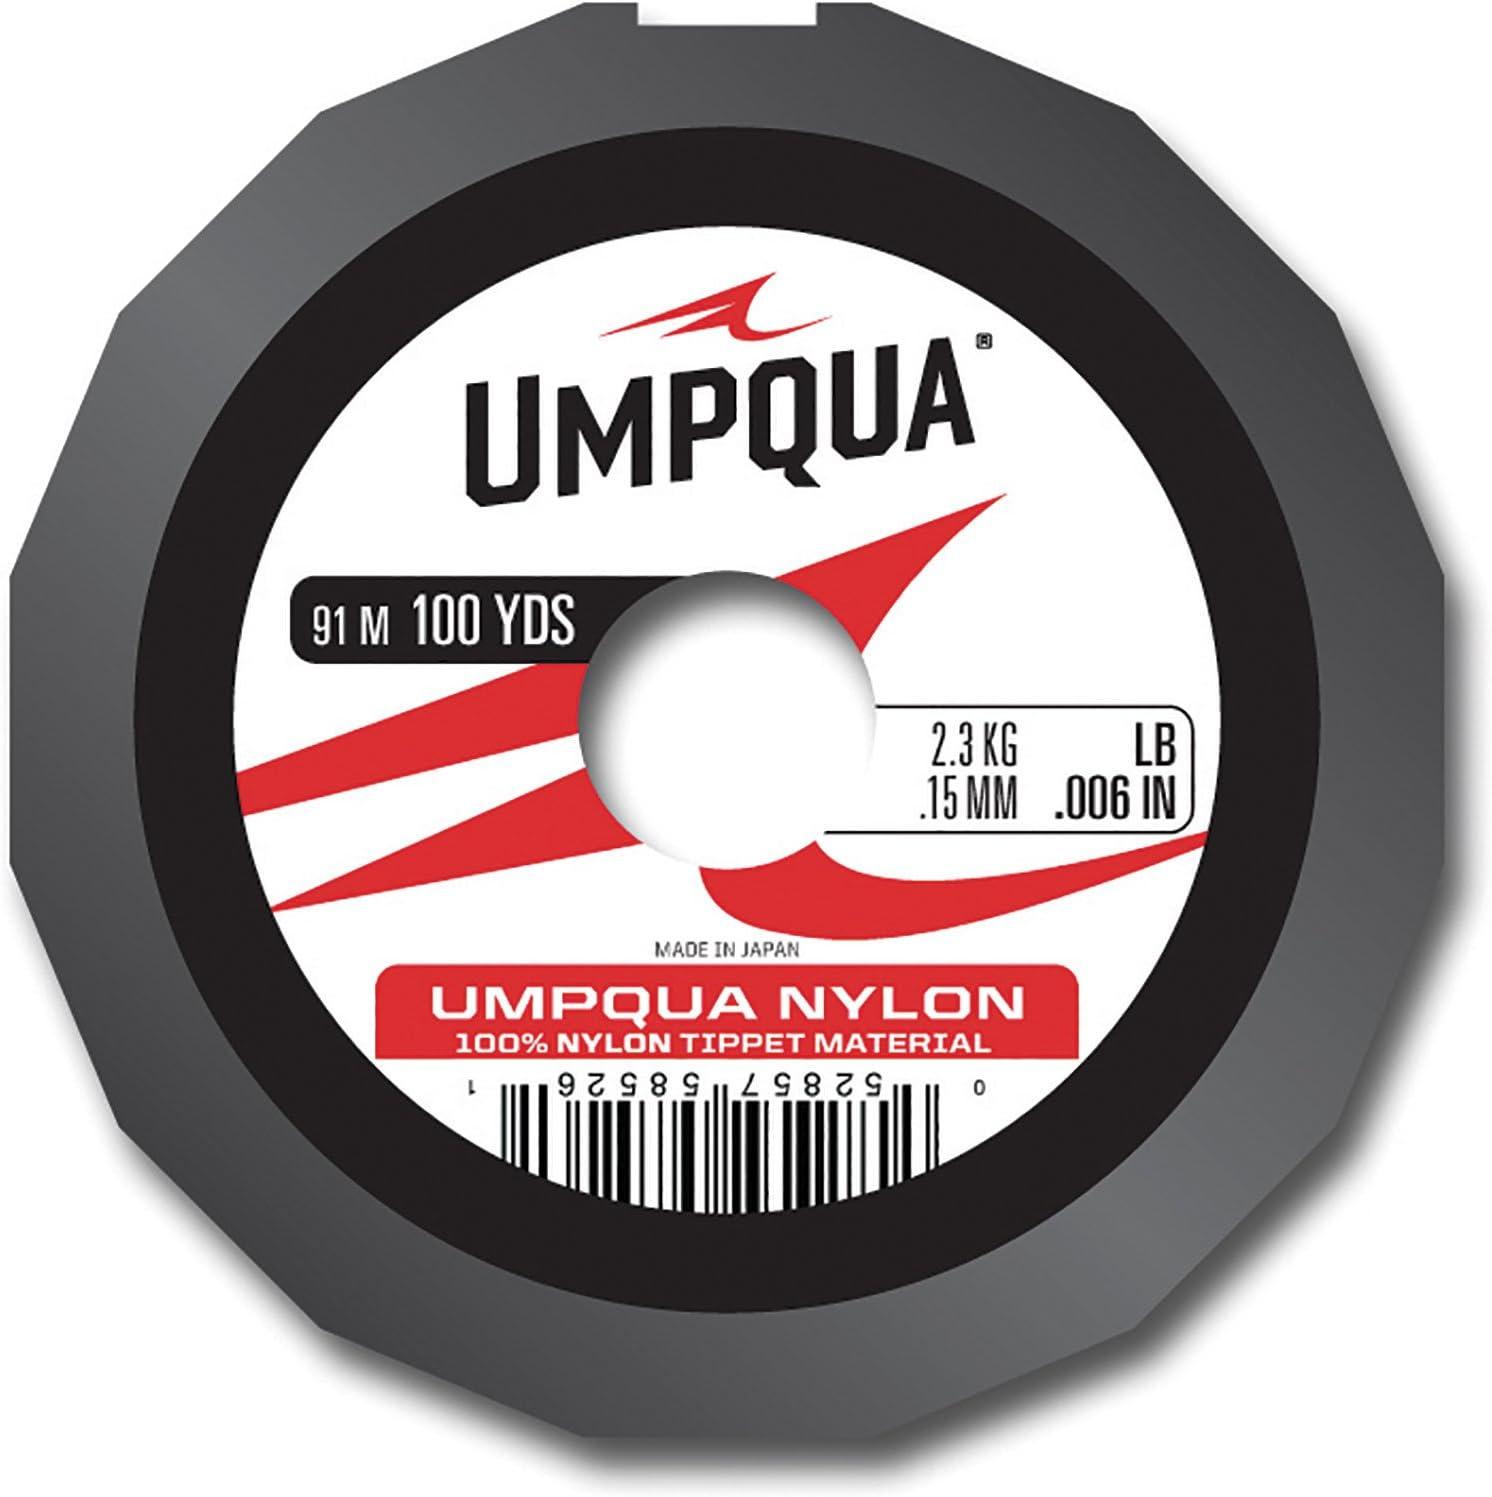 Umpqua Nylon Fly Fishing Tippet Material 0X 15lb 30yds